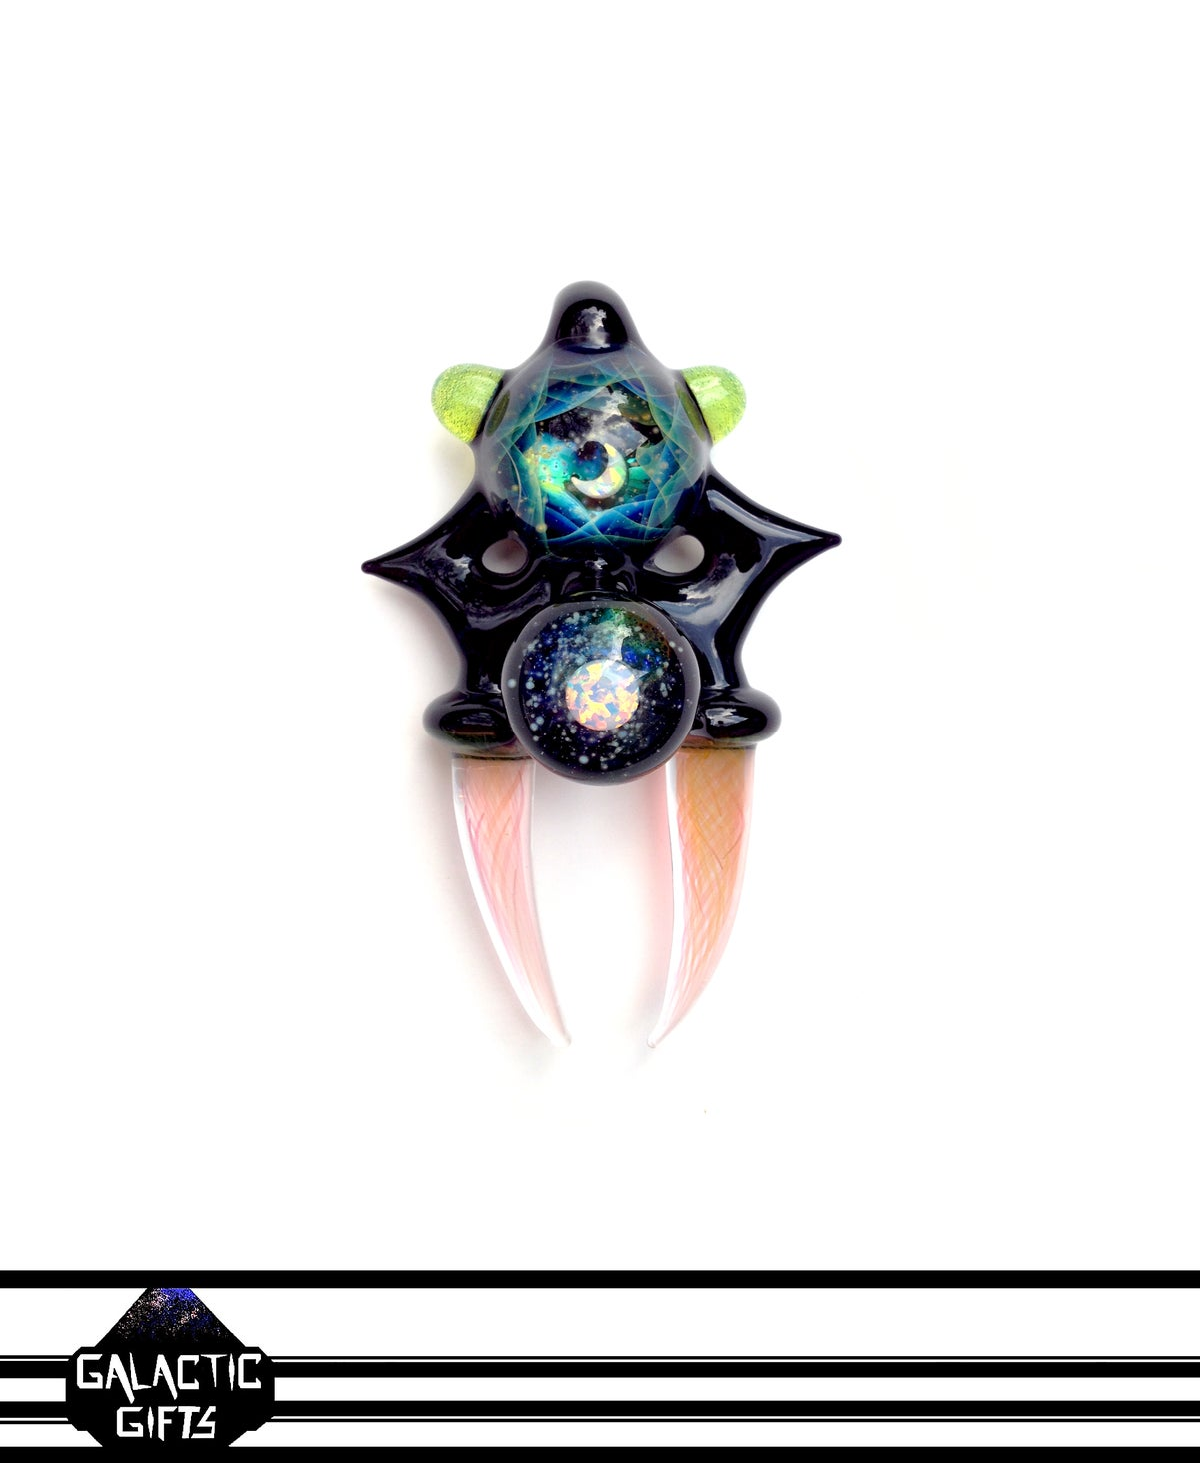 Image of Atsushi Sasaki & Big Z Opal Crescent Moon Space Key Coin Series Collab Banger Pendant